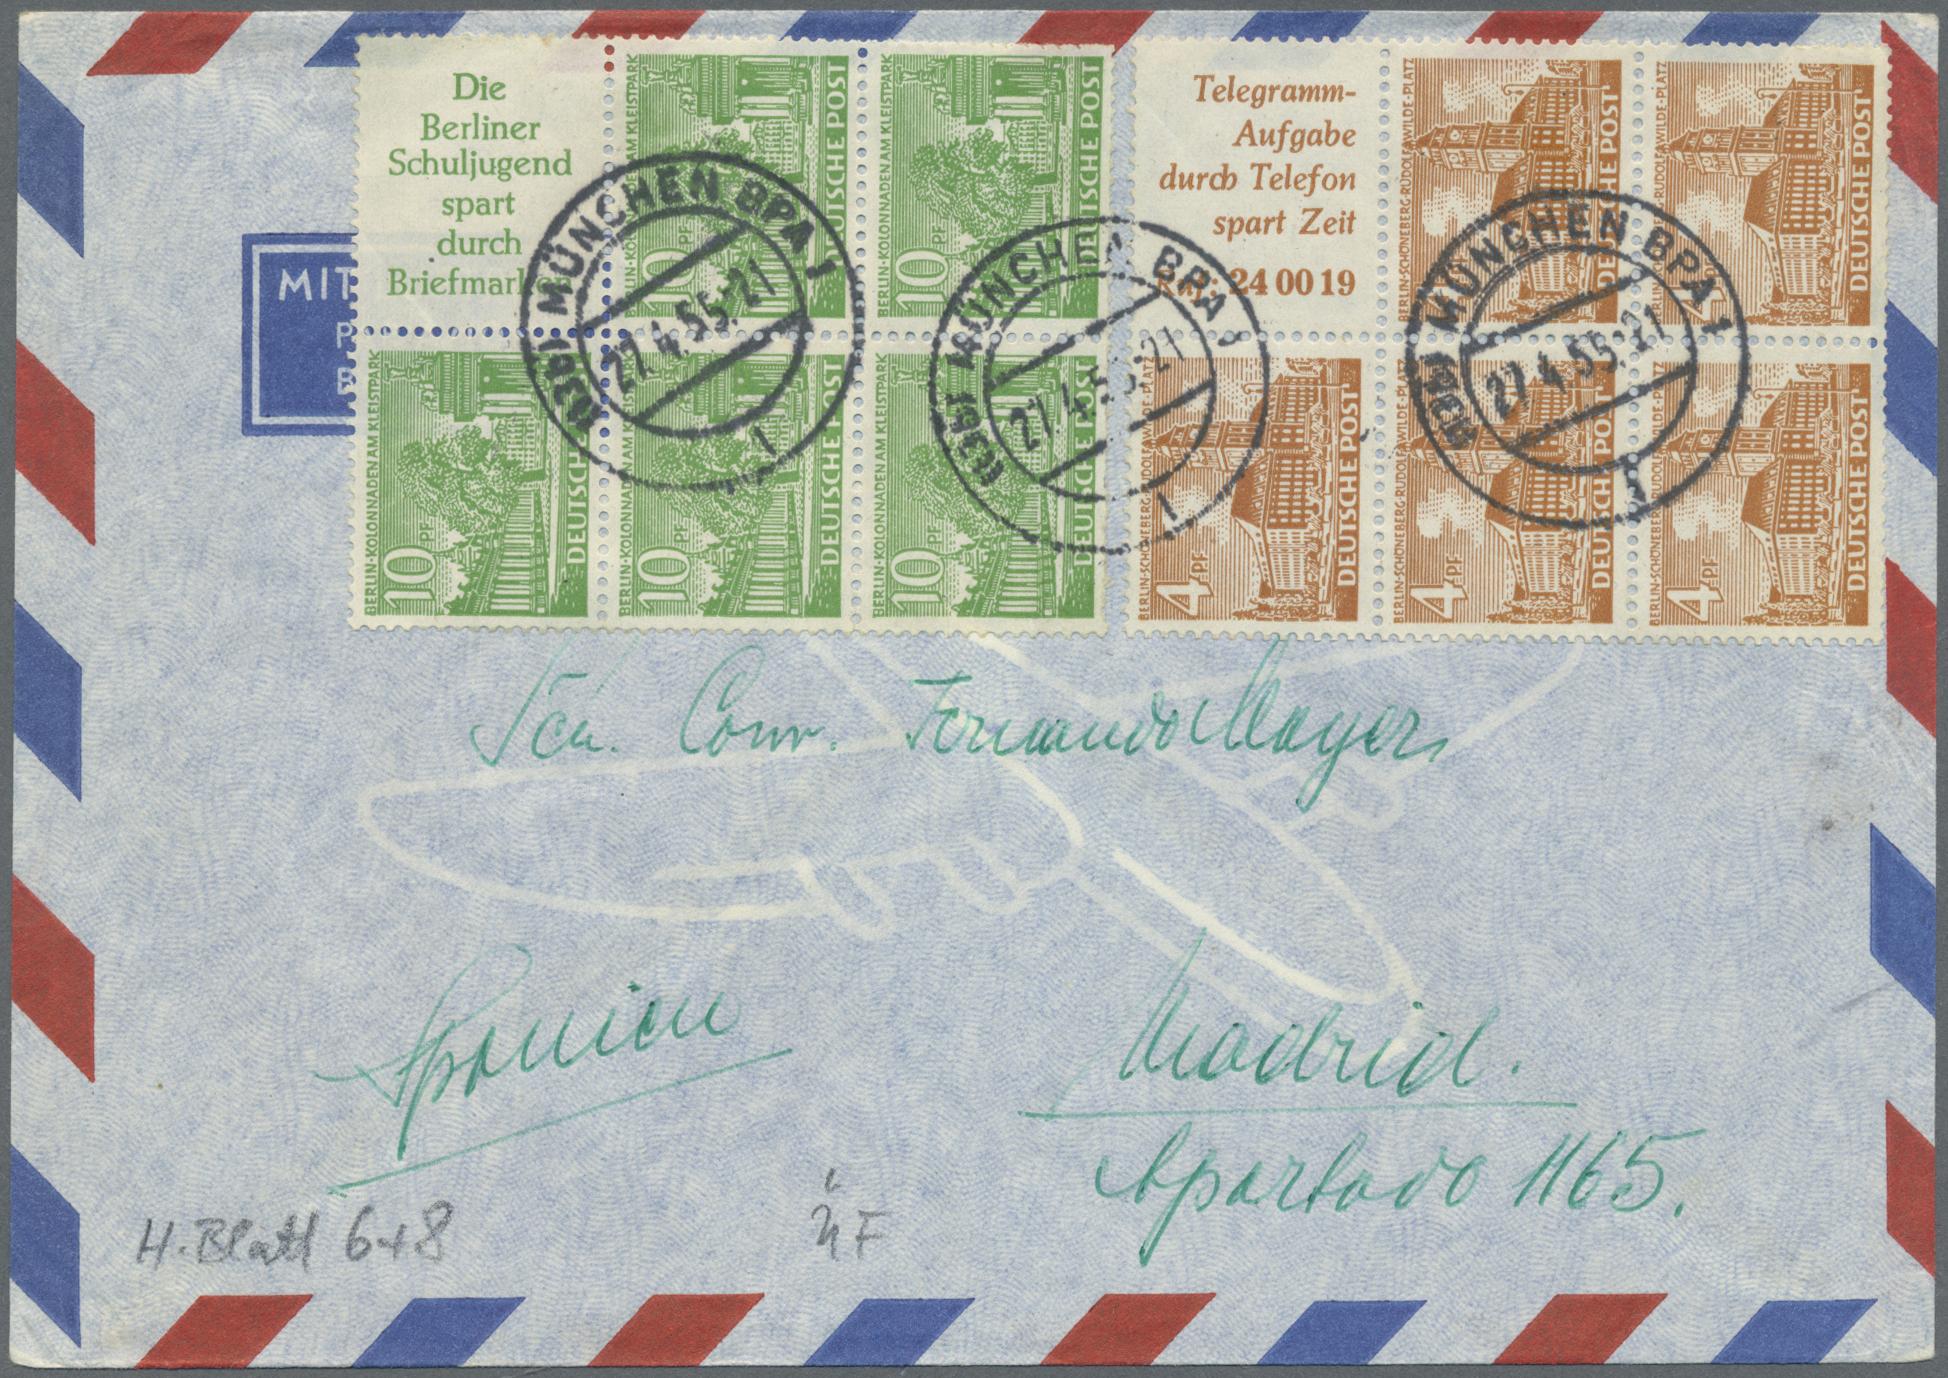 Lot 32538 - berlin - zusammendrucke  -  Auktionshaus Christoph Gärtner GmbH & Co. KG Auction #40 Collections Germany, Wunderkartons